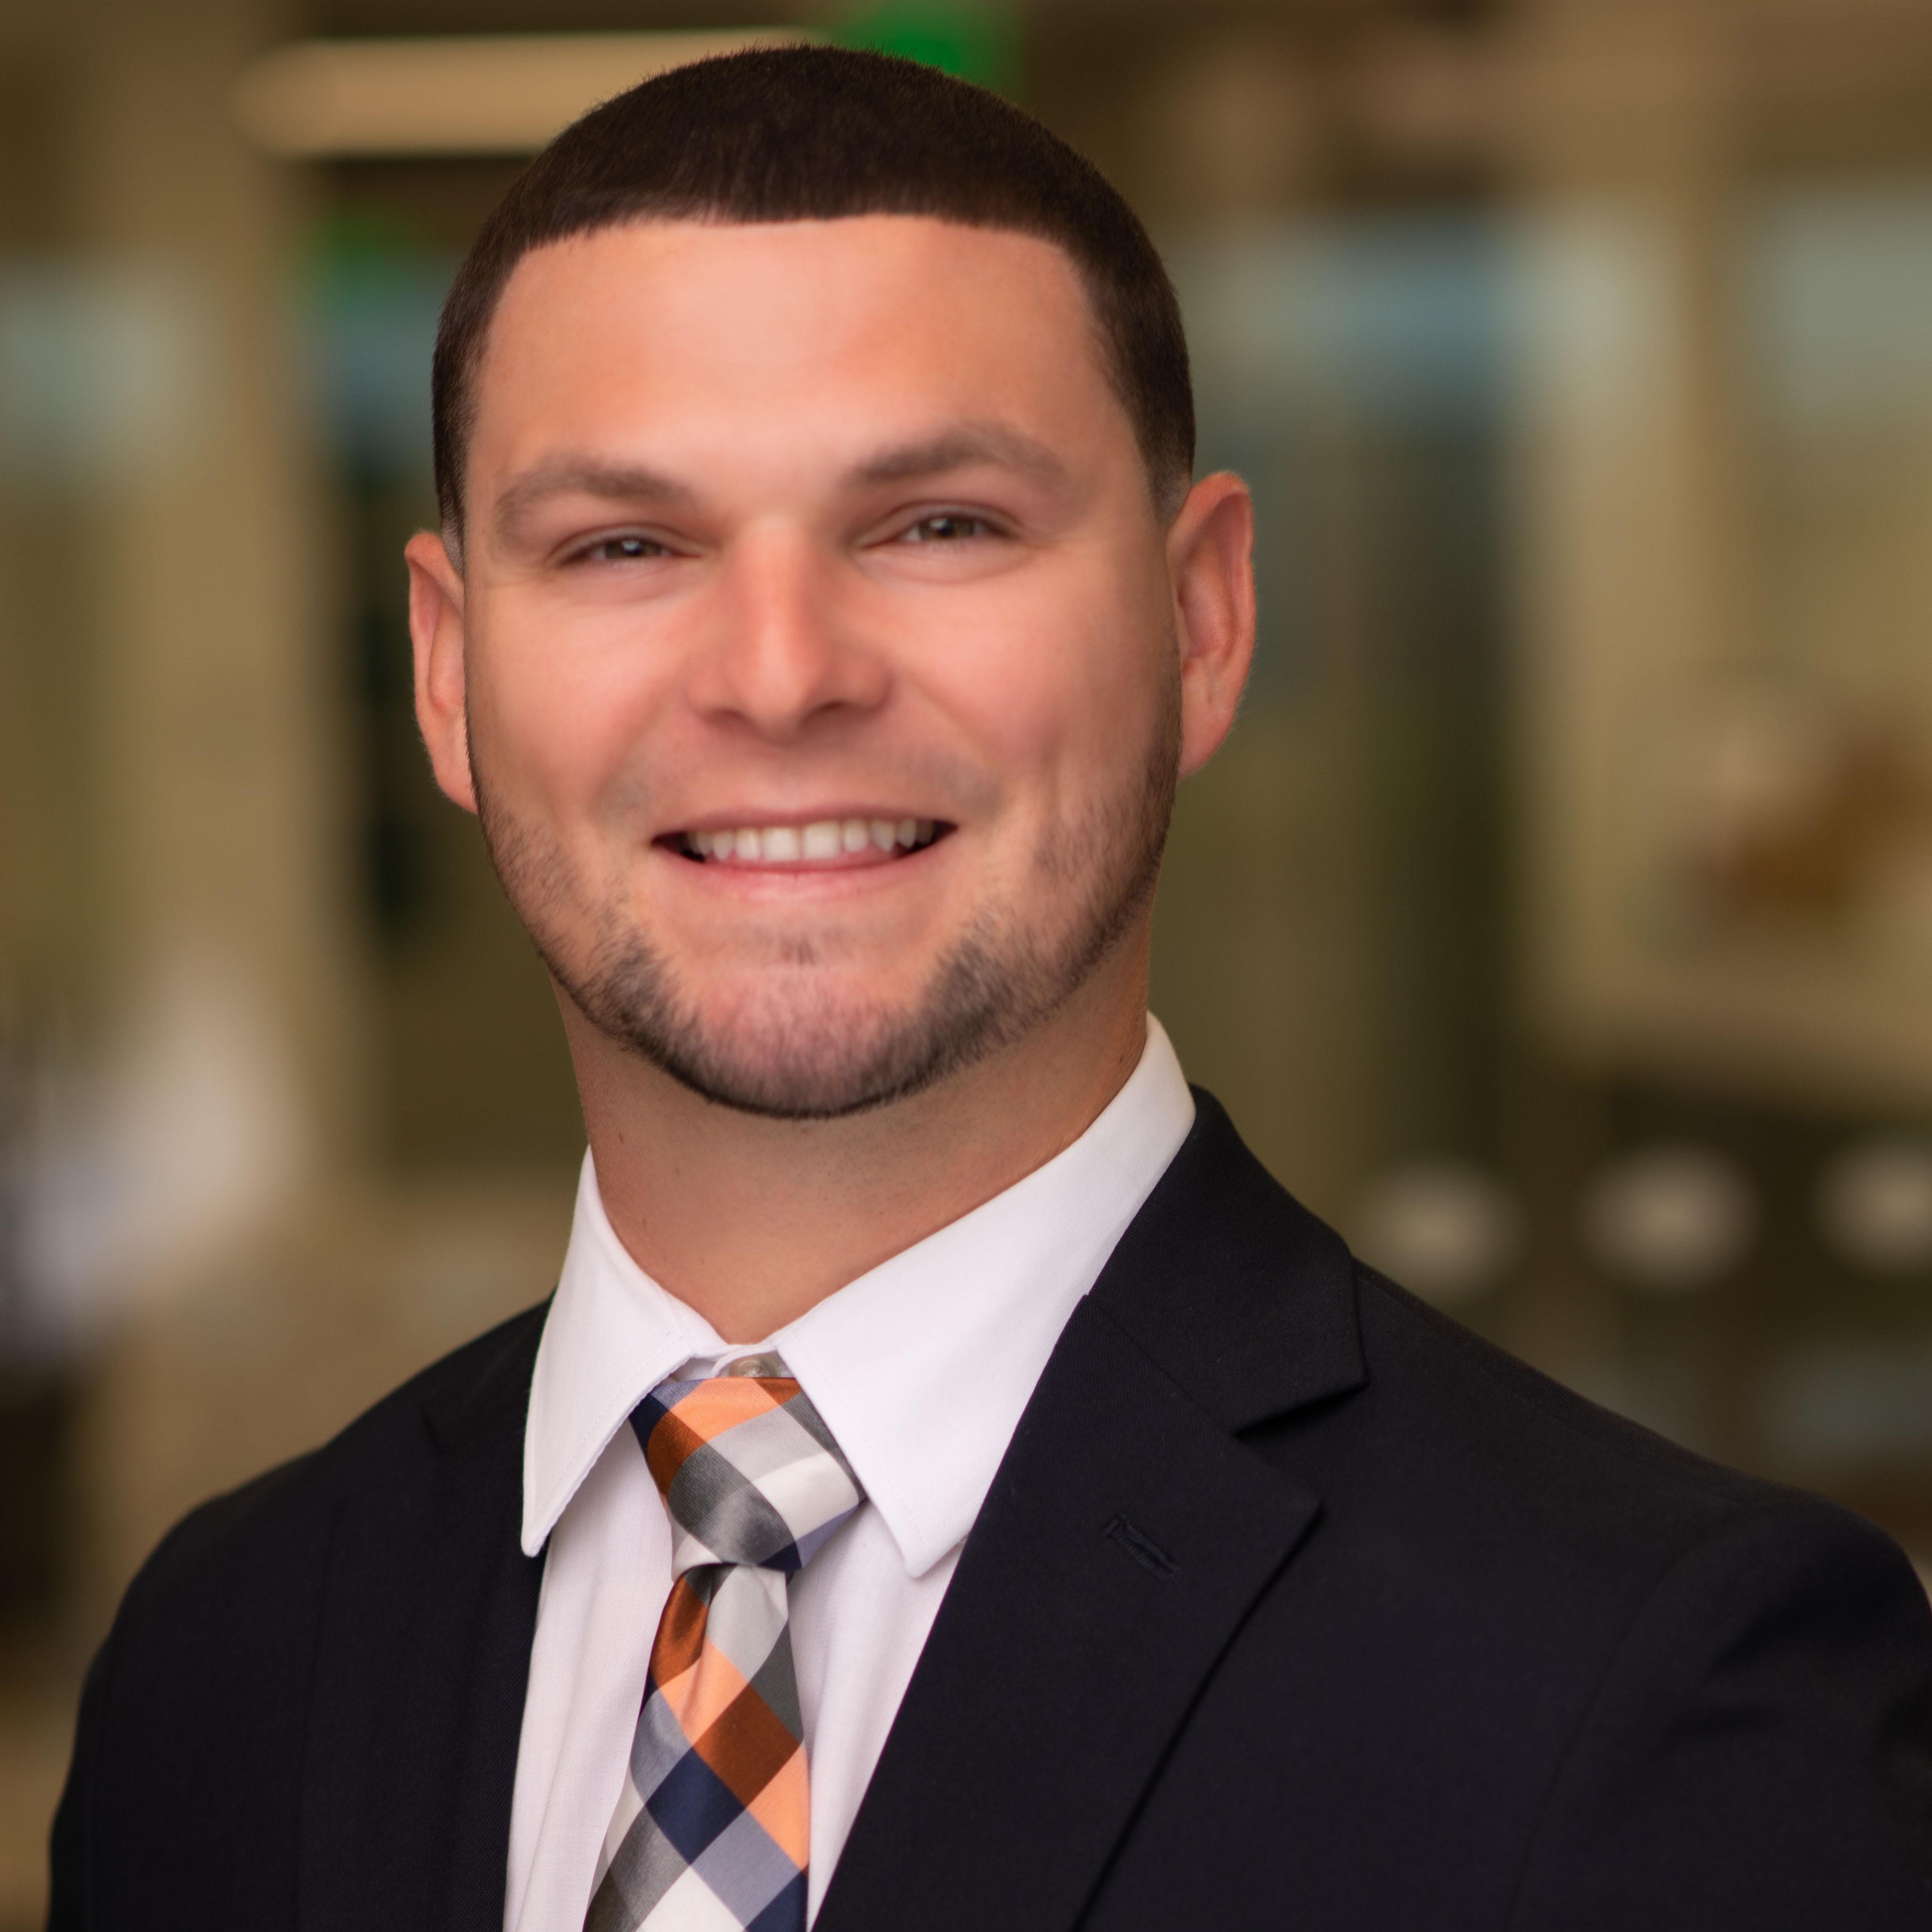 DAWSON MICHAEL SHIRLEY  Your Financial Professional & Insurance Agent